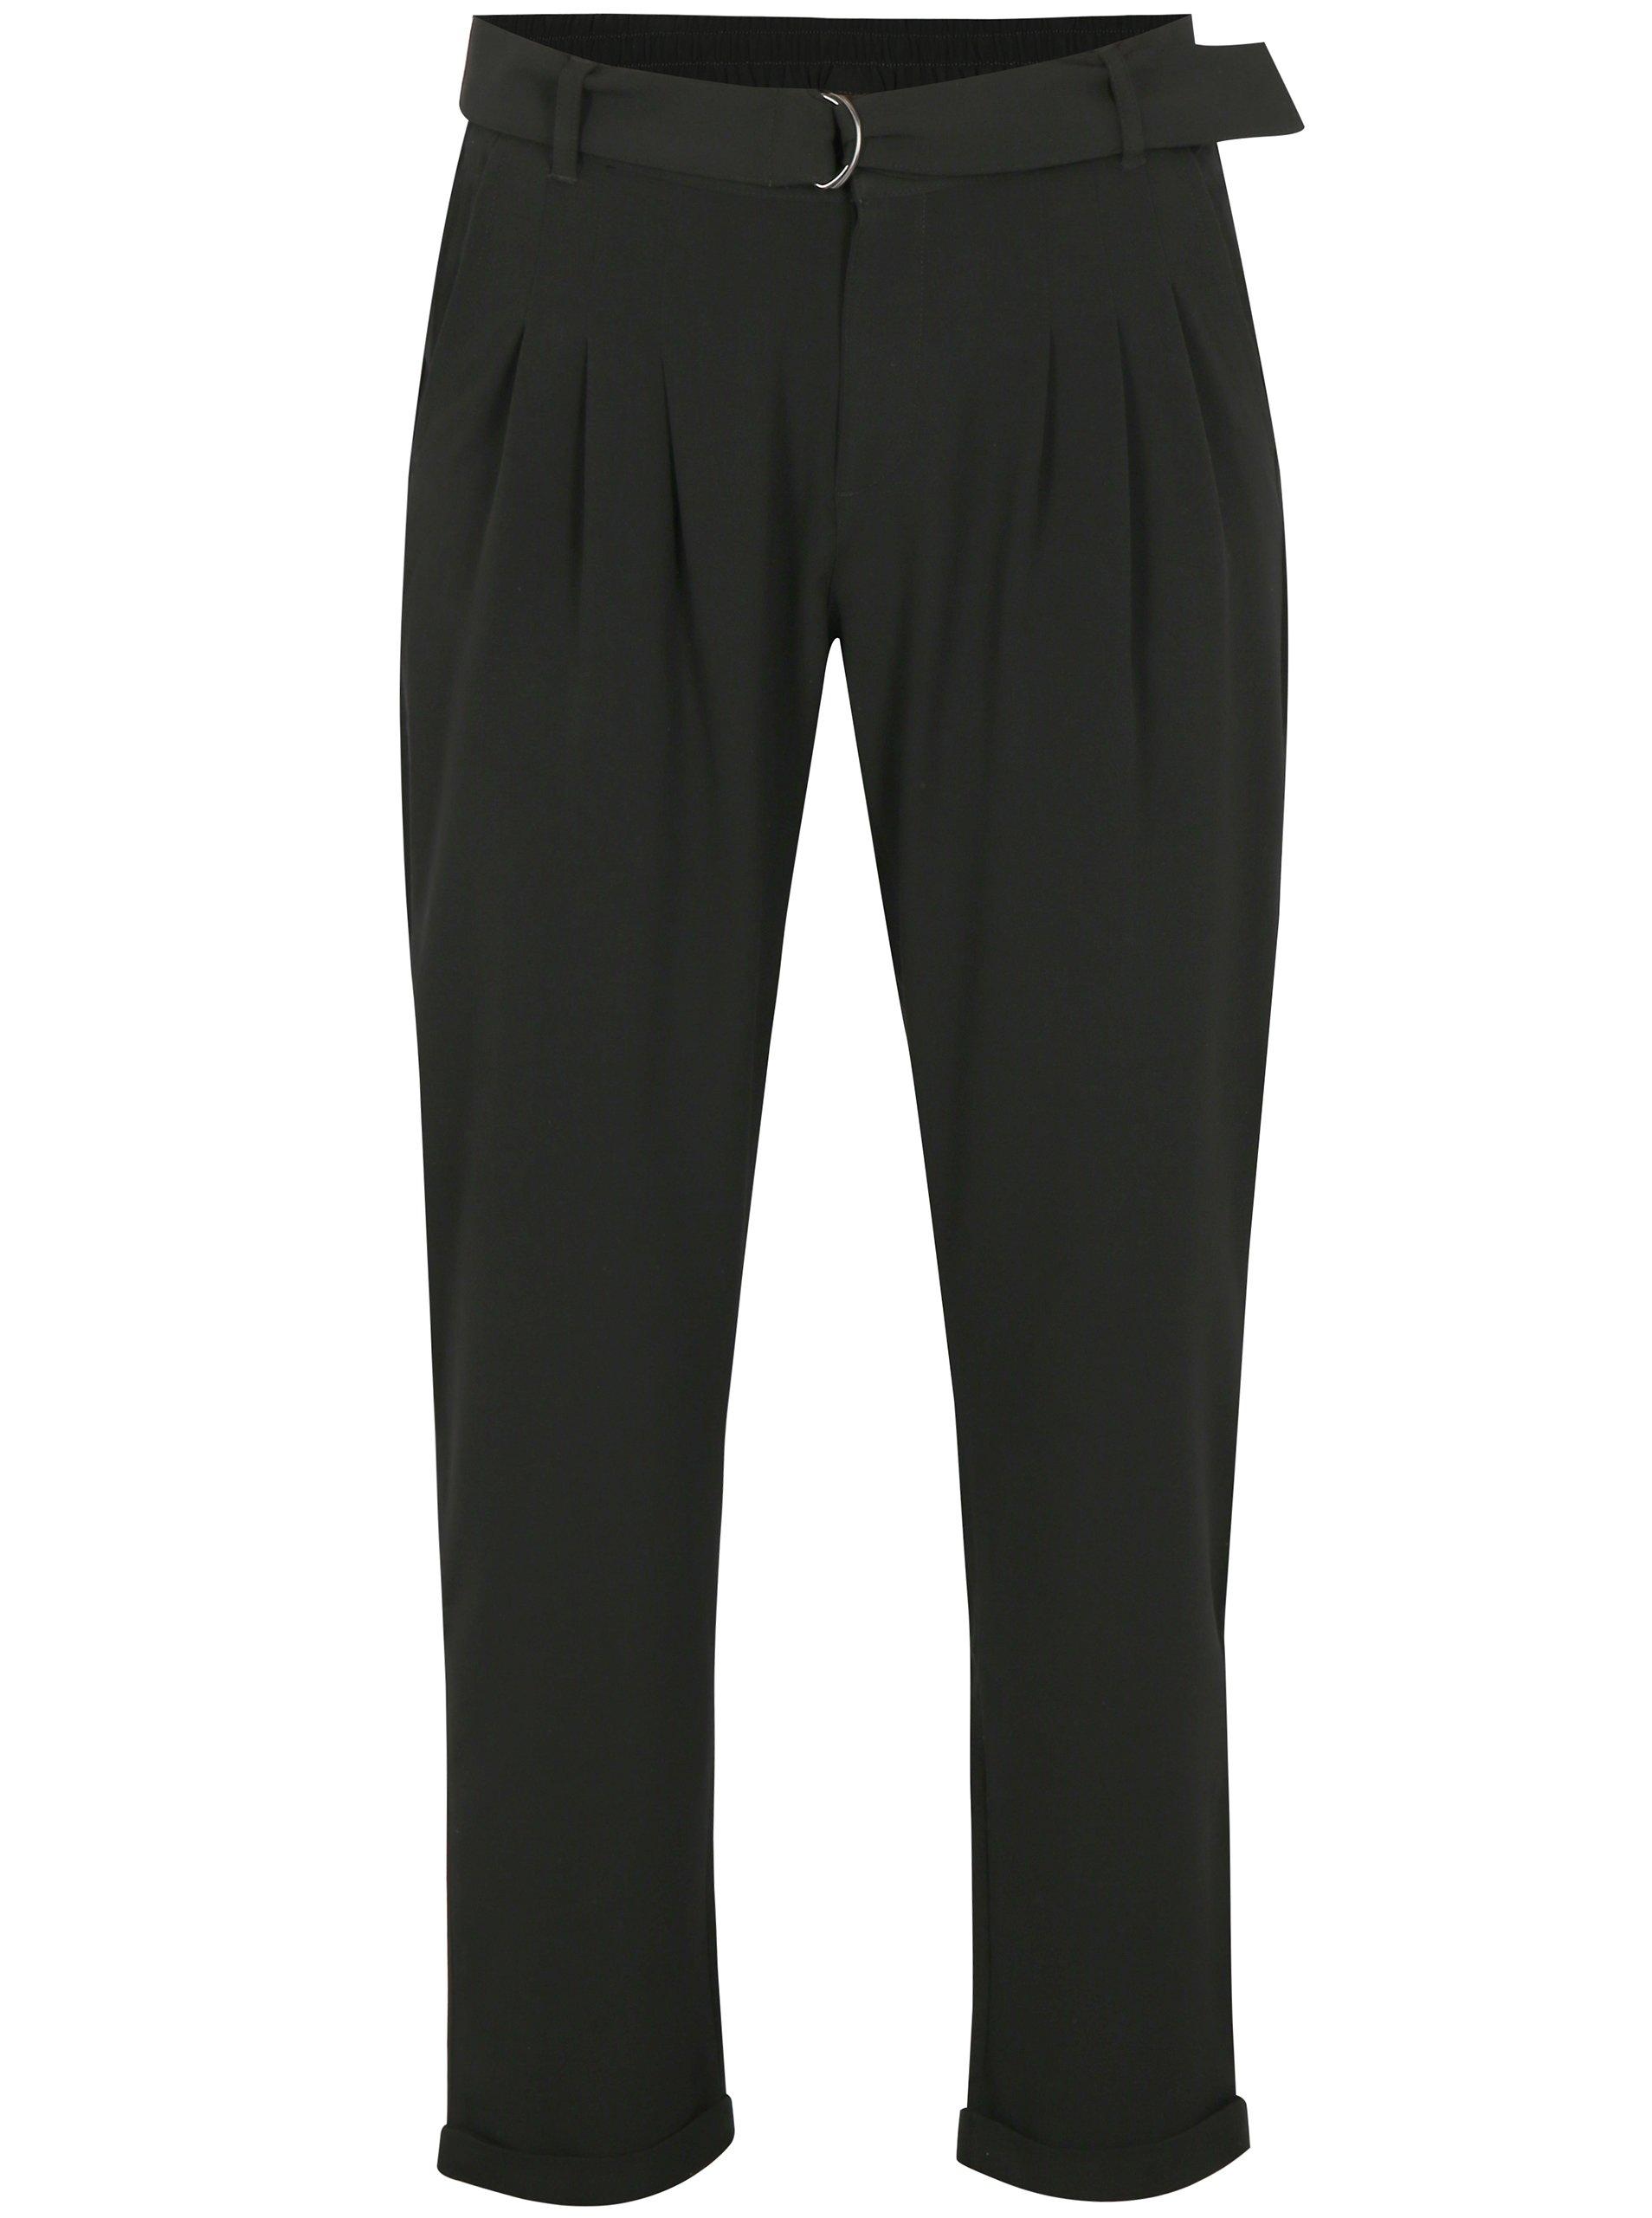 Čierne nohavice s vreckami a vysokým sedom Jacqueline de Yong Bax